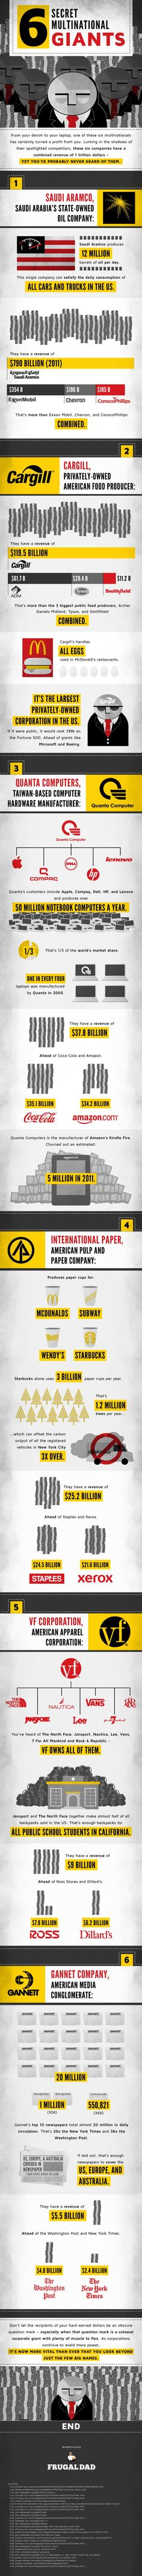 6 secret multinational giants #infographic